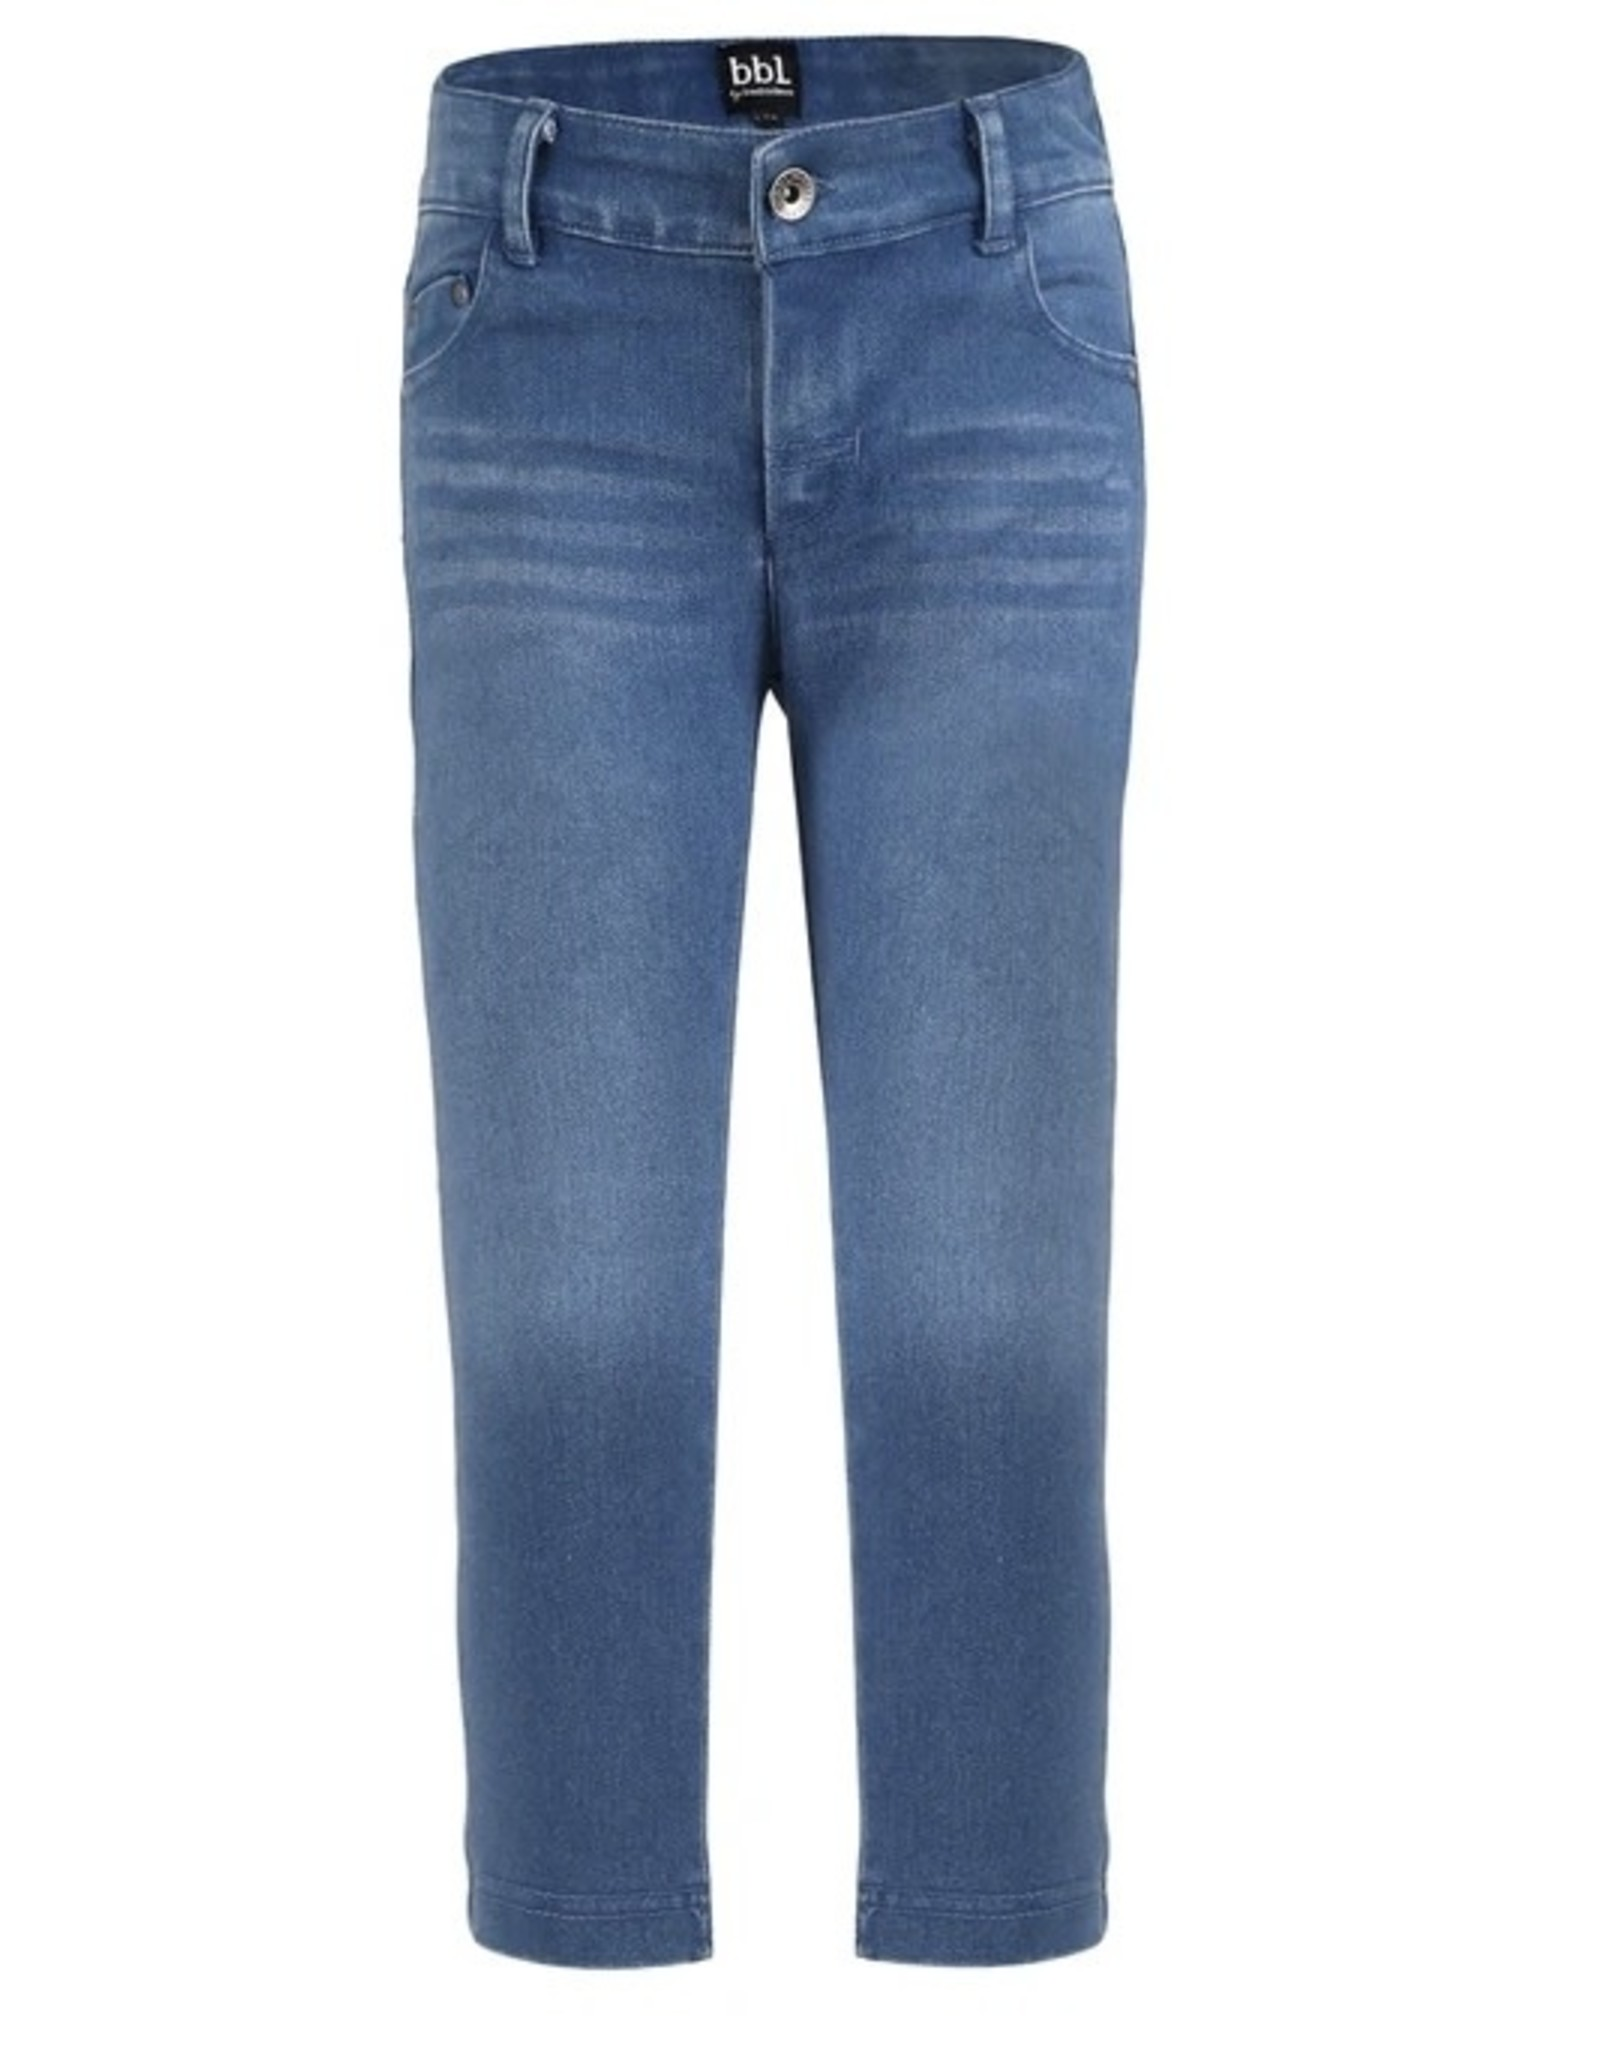 Beebielove 2610 Jeans